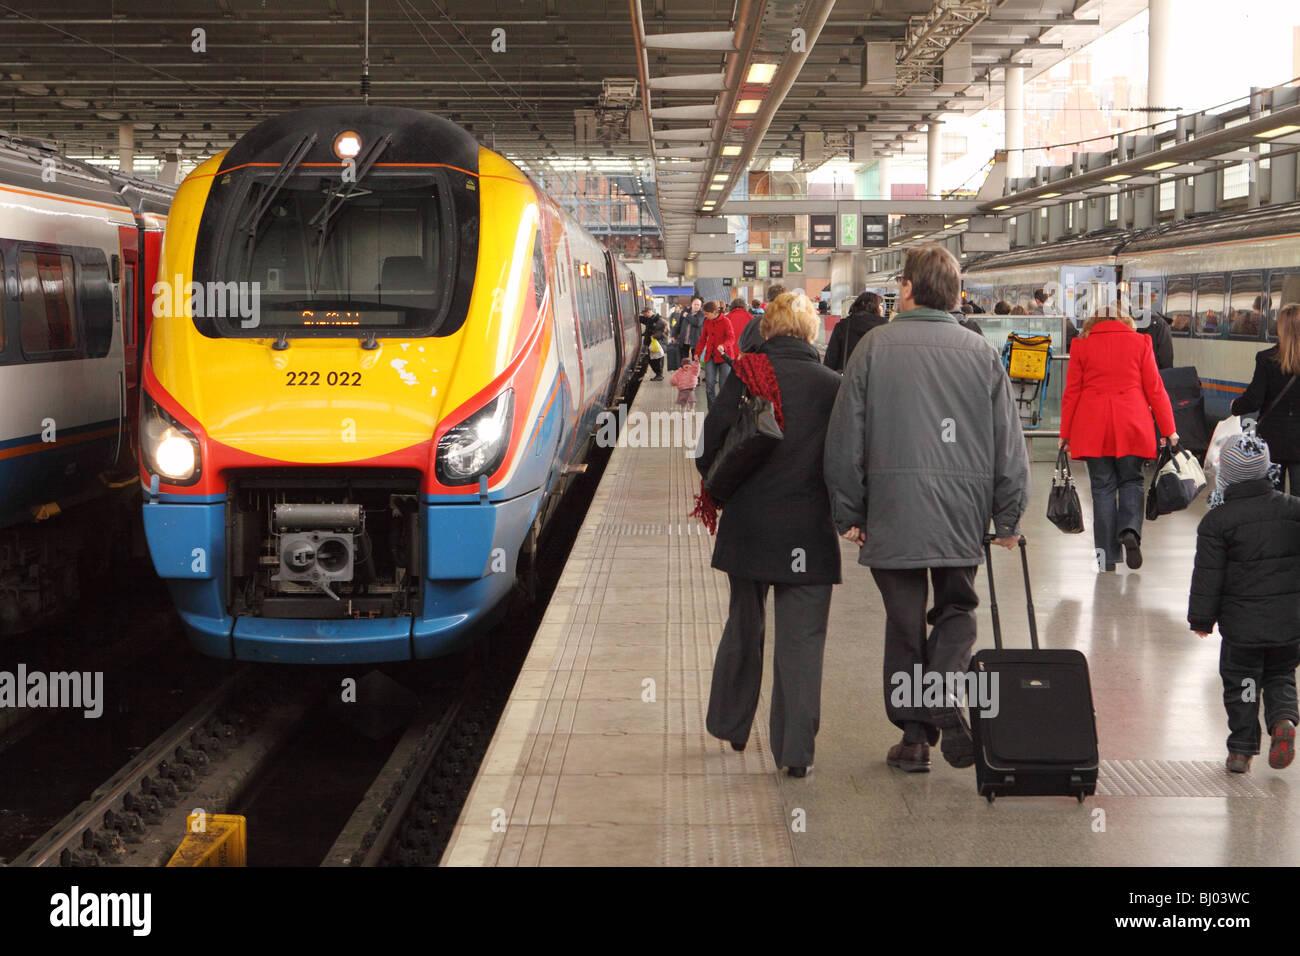 St Pancras railway station London passengers walk past an East Midlands Trains Class 222 Meridian train - Stock Image